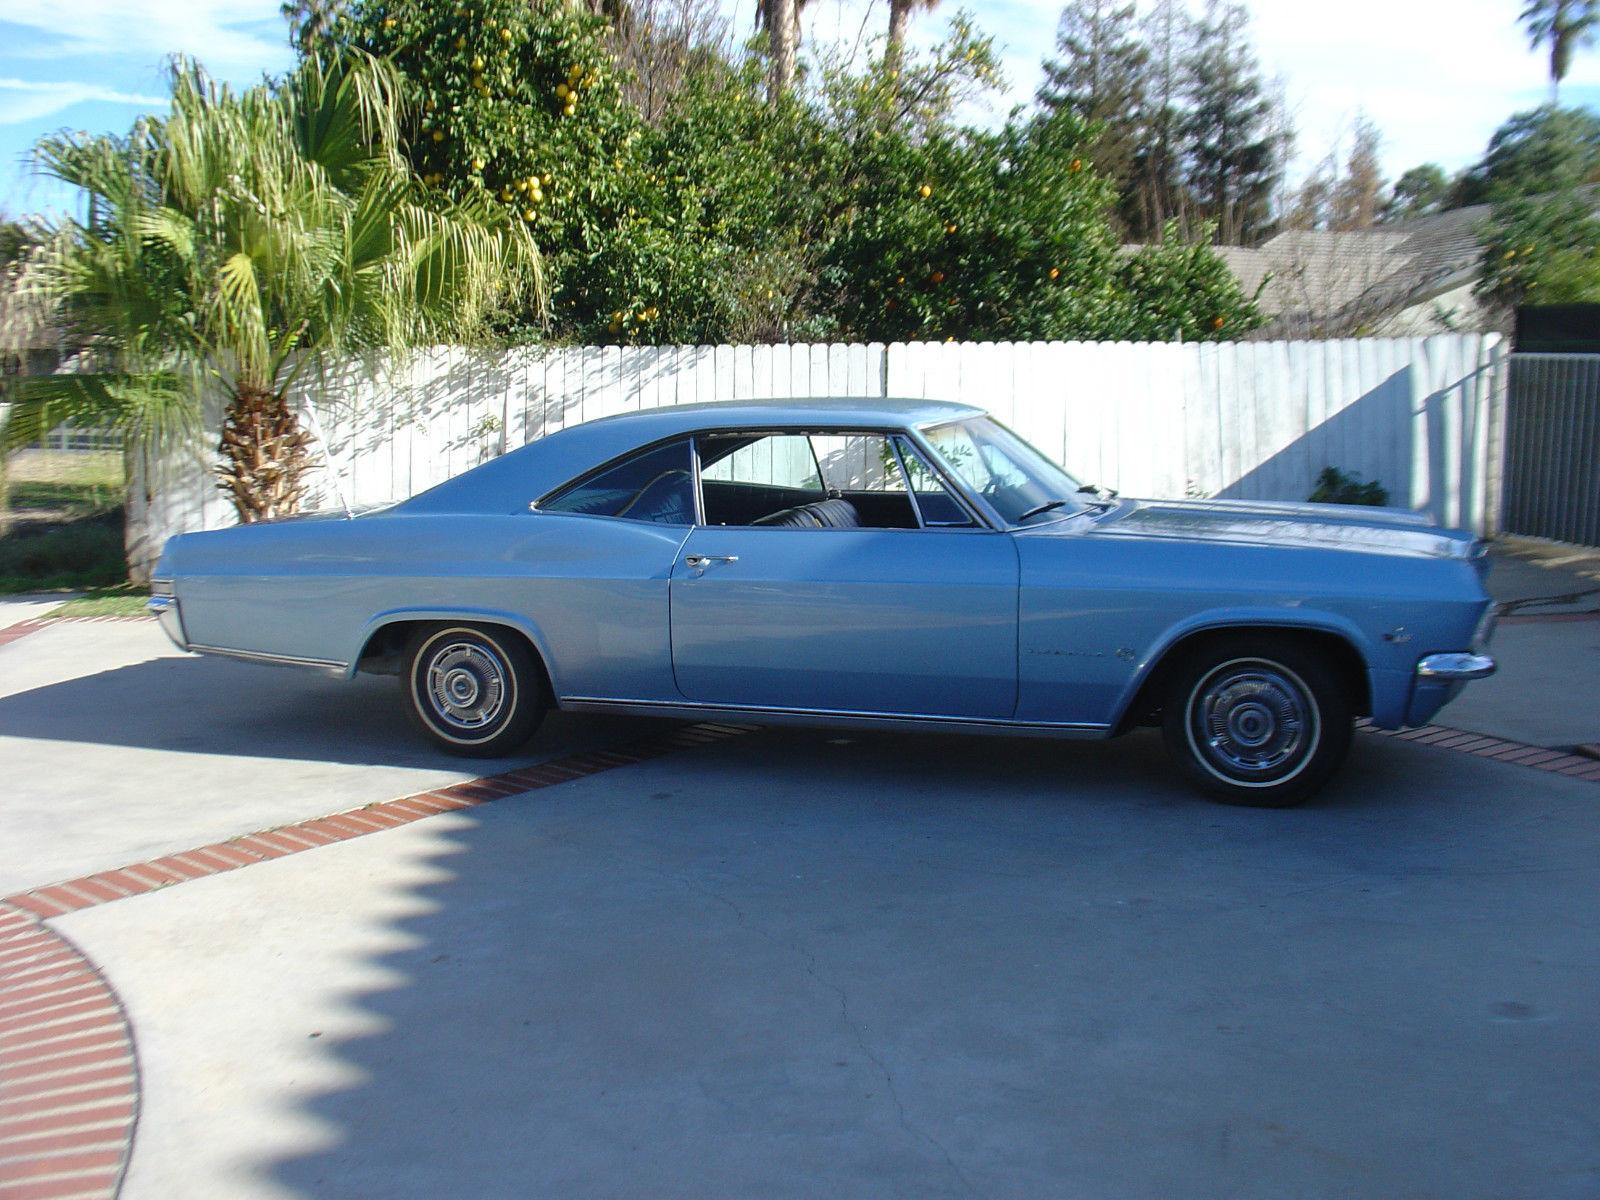 1965 Chevy Impala Fastback Coupe Black Ca Plates 1962 1963 1964 1966 2 Door 1967